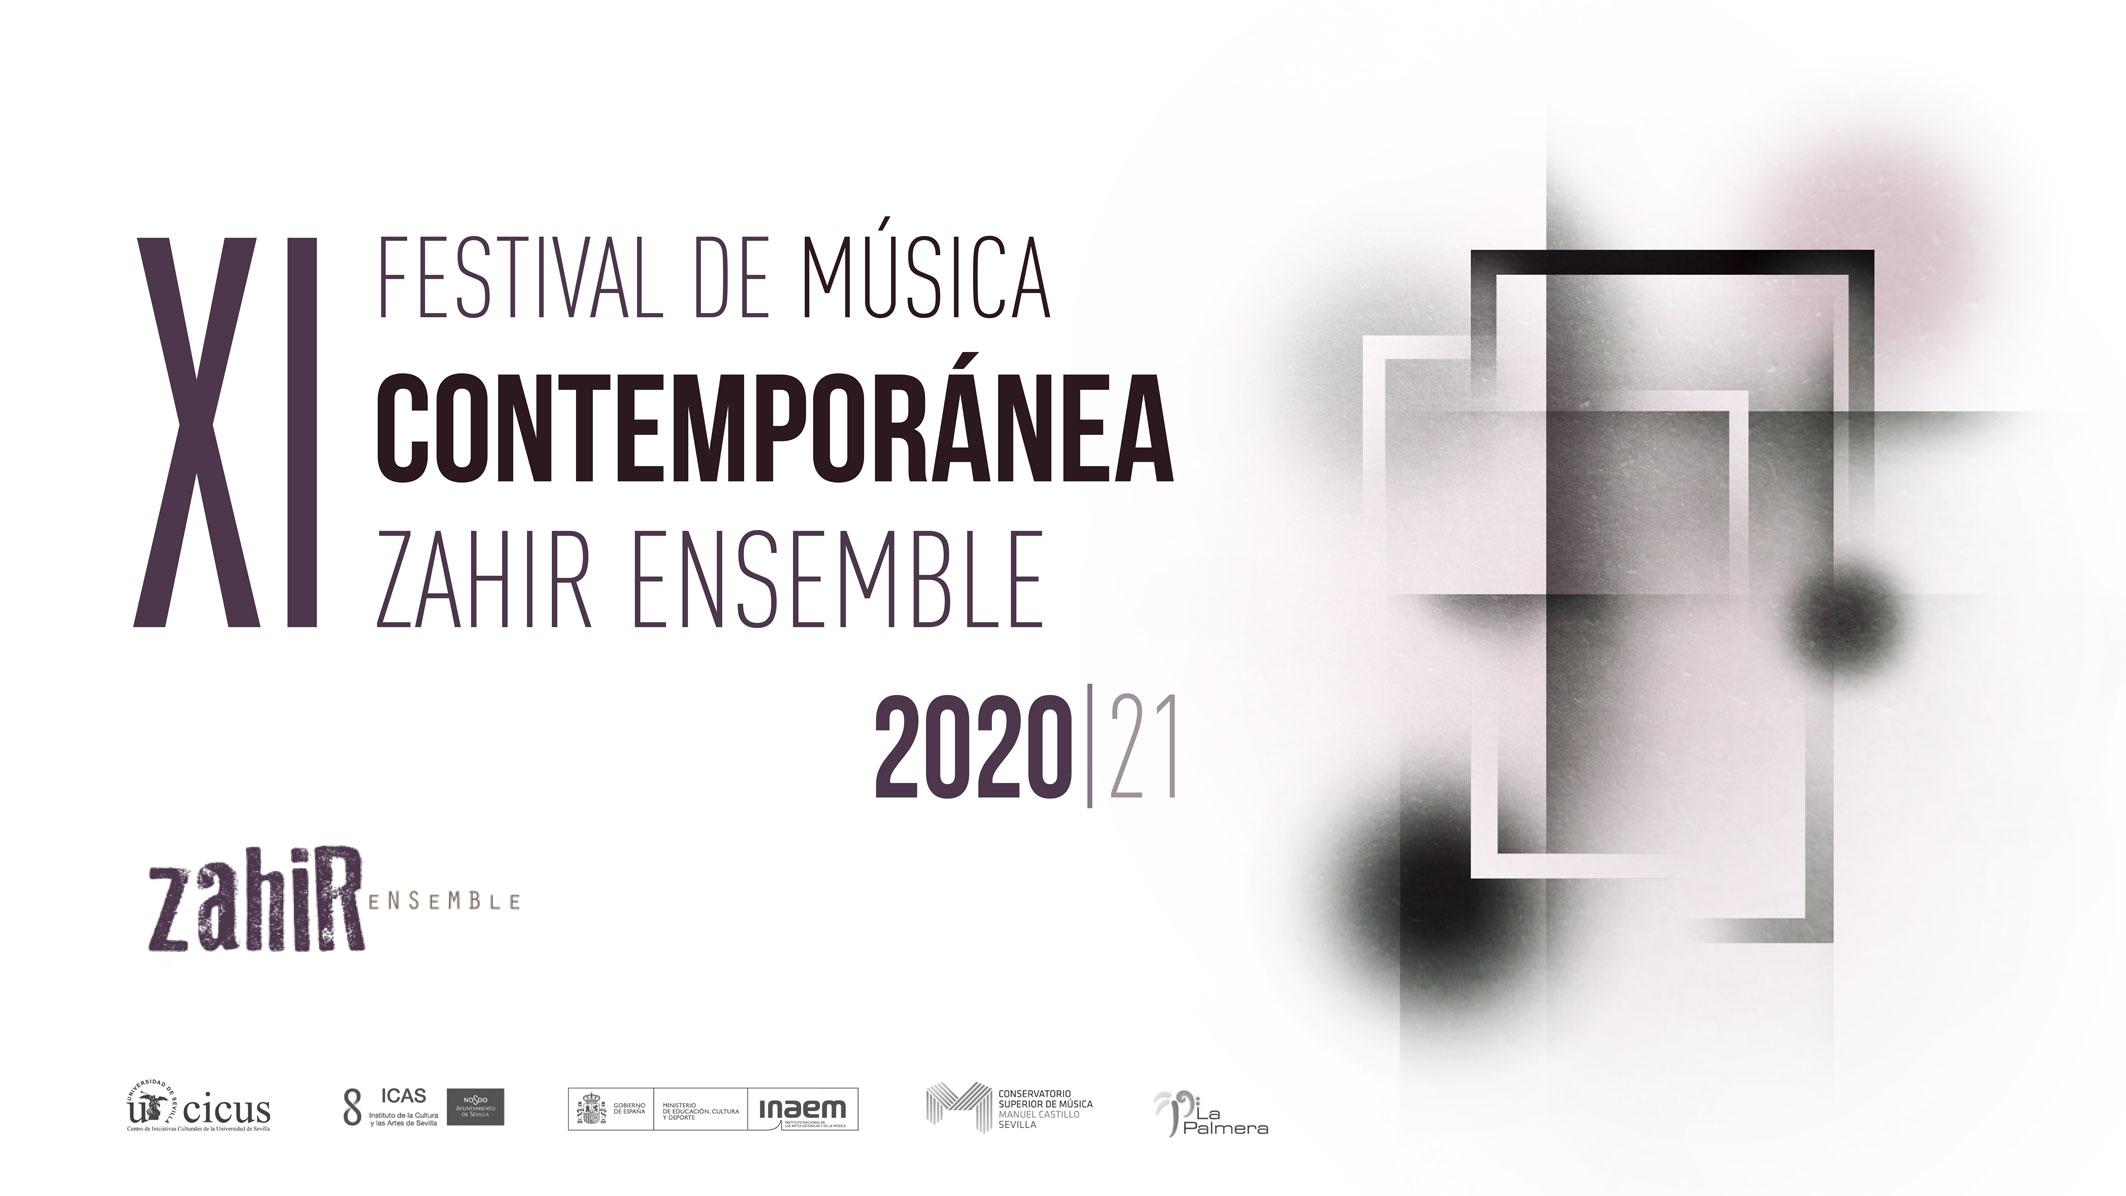 XI Festival de Música Contemporánea Zahir Ensemble 2020|21